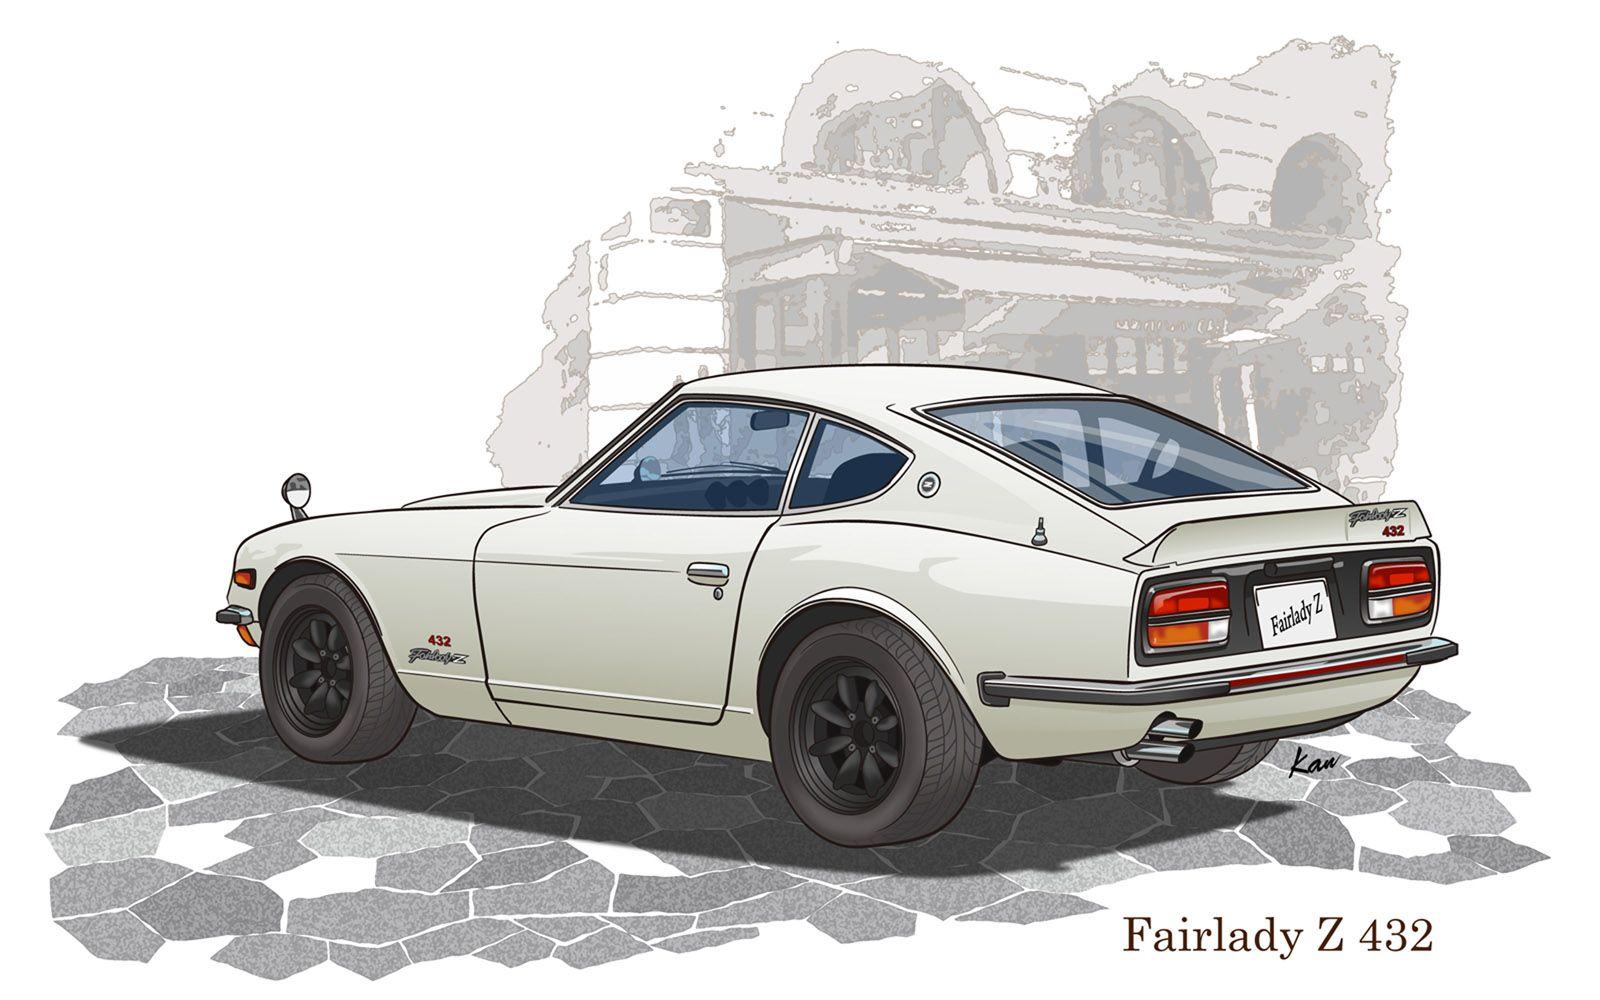 fairladyz 432 car illustration automotive artwork nissan cars fairladyz 432 car illustration